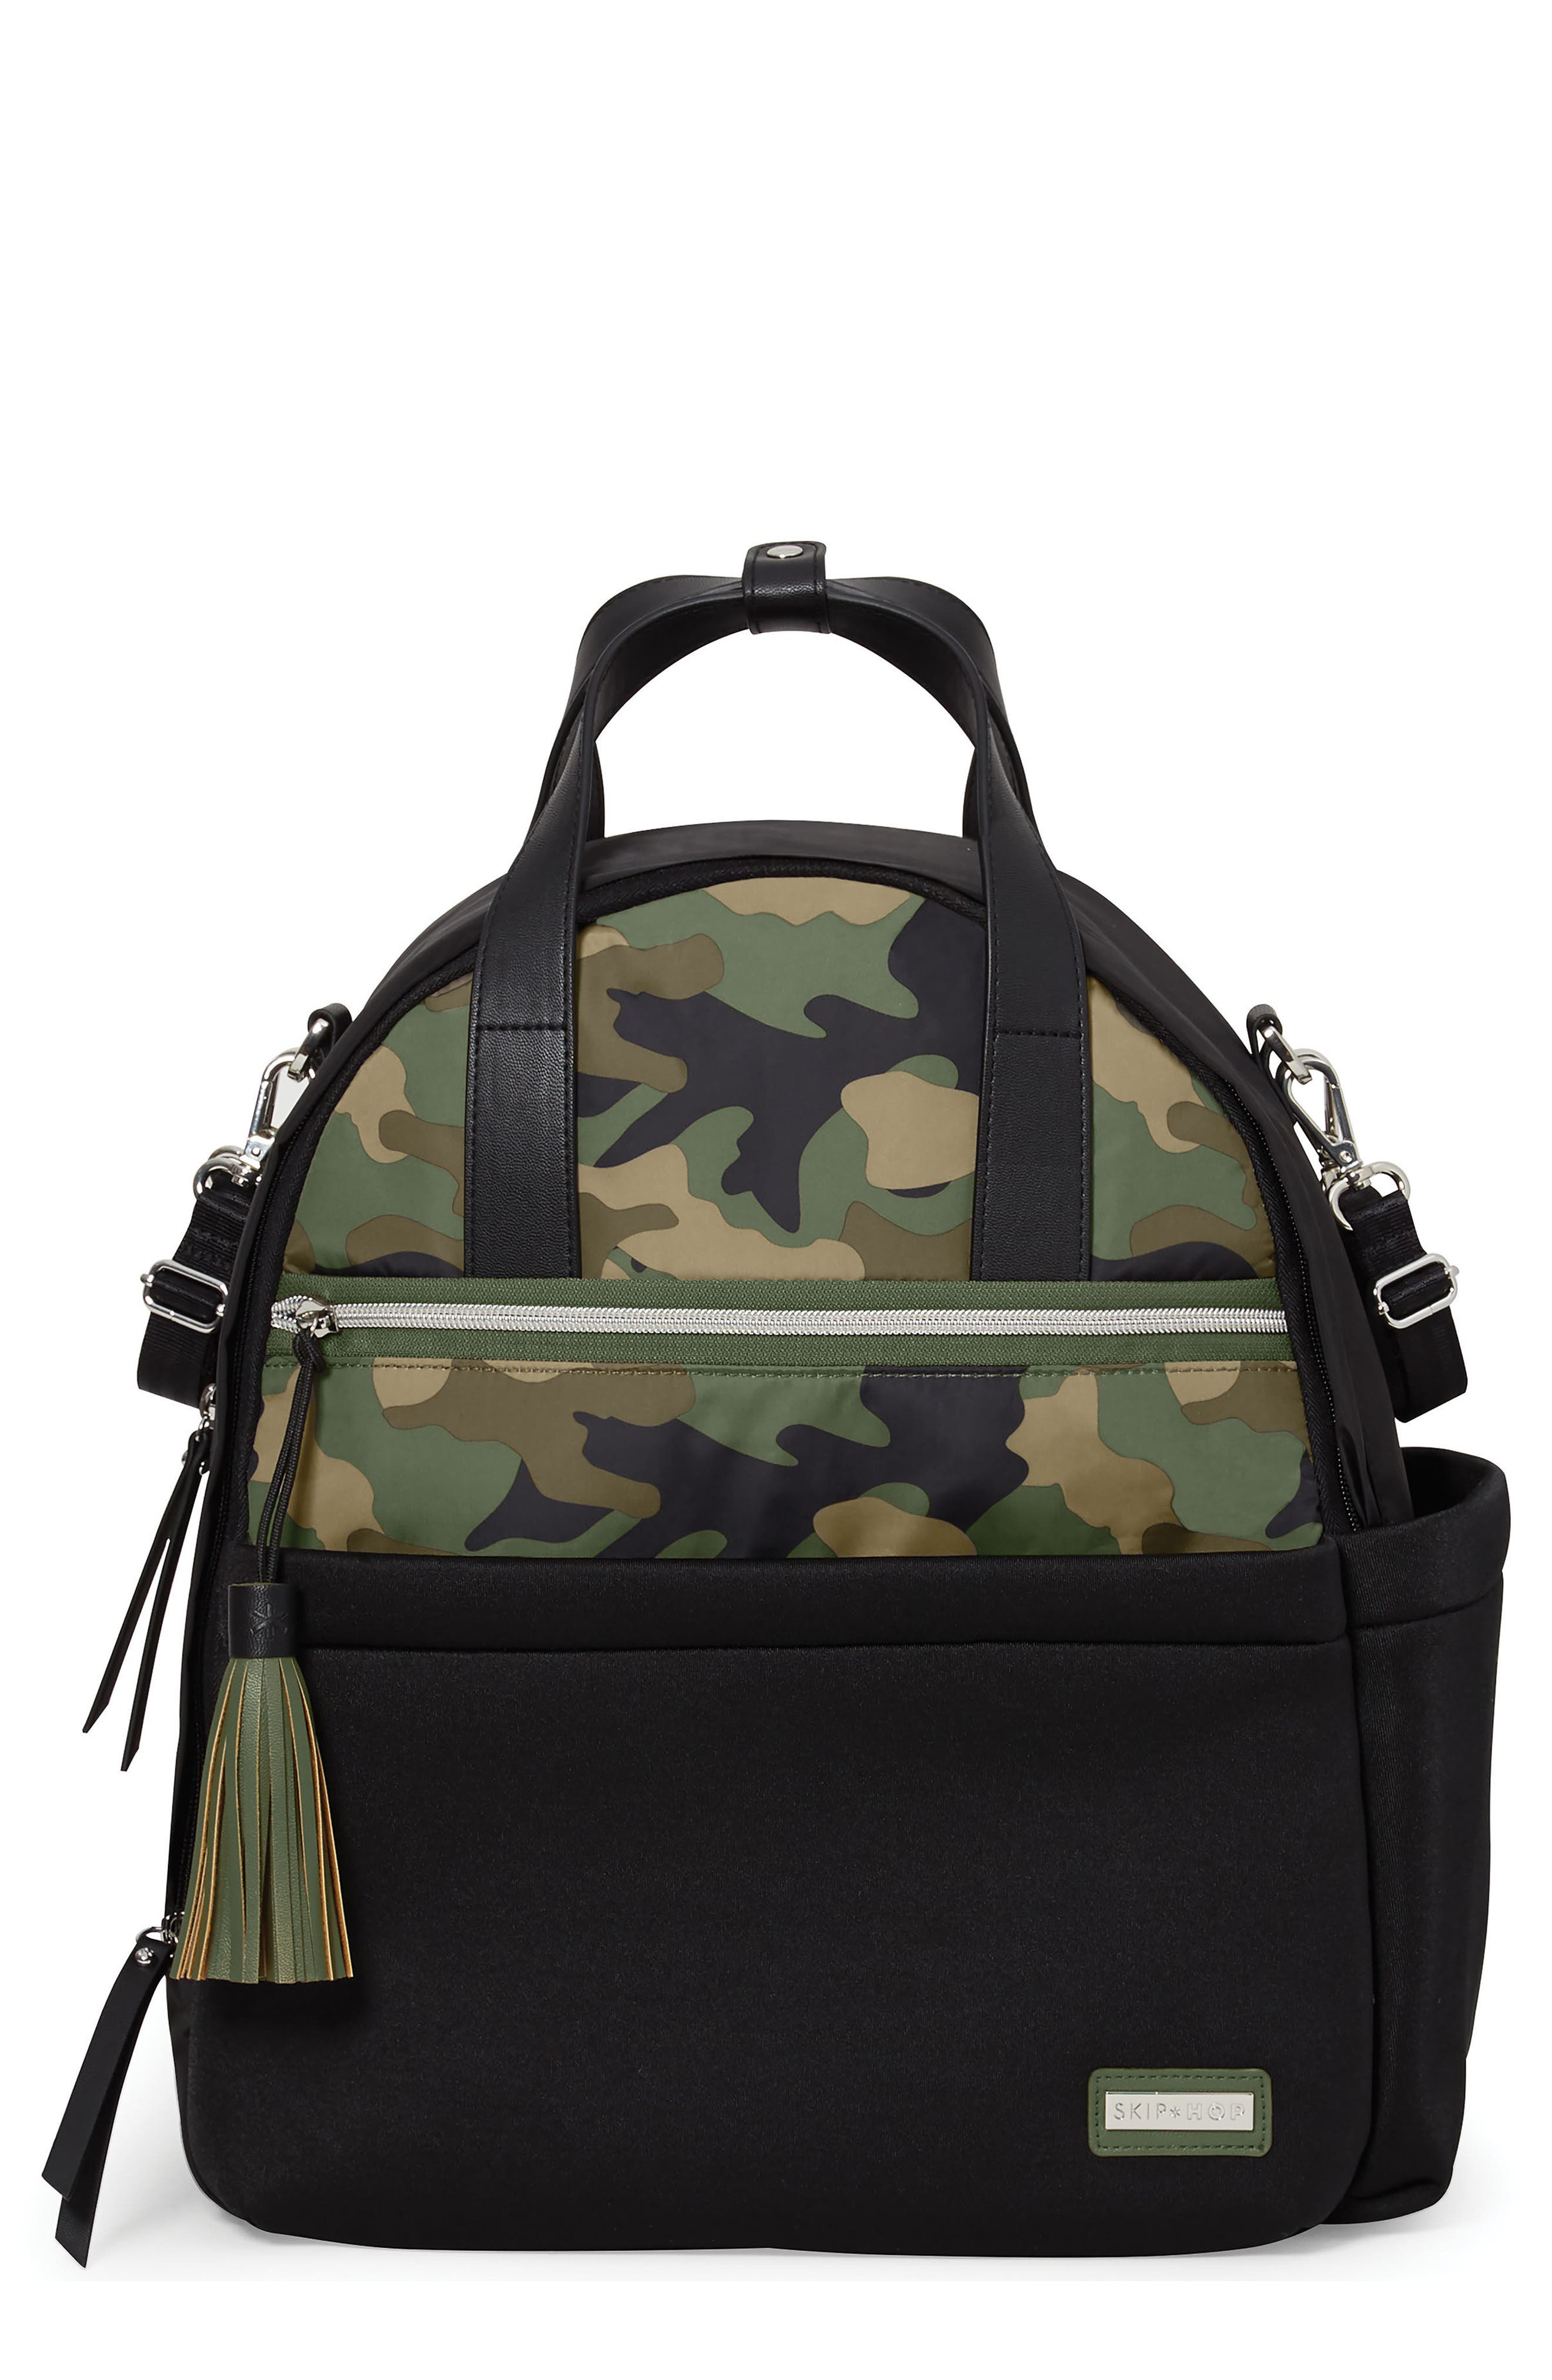 Nolita Neoprene Diaper Backpack,                         Main,                         color, BLACK/ DARK CAMO